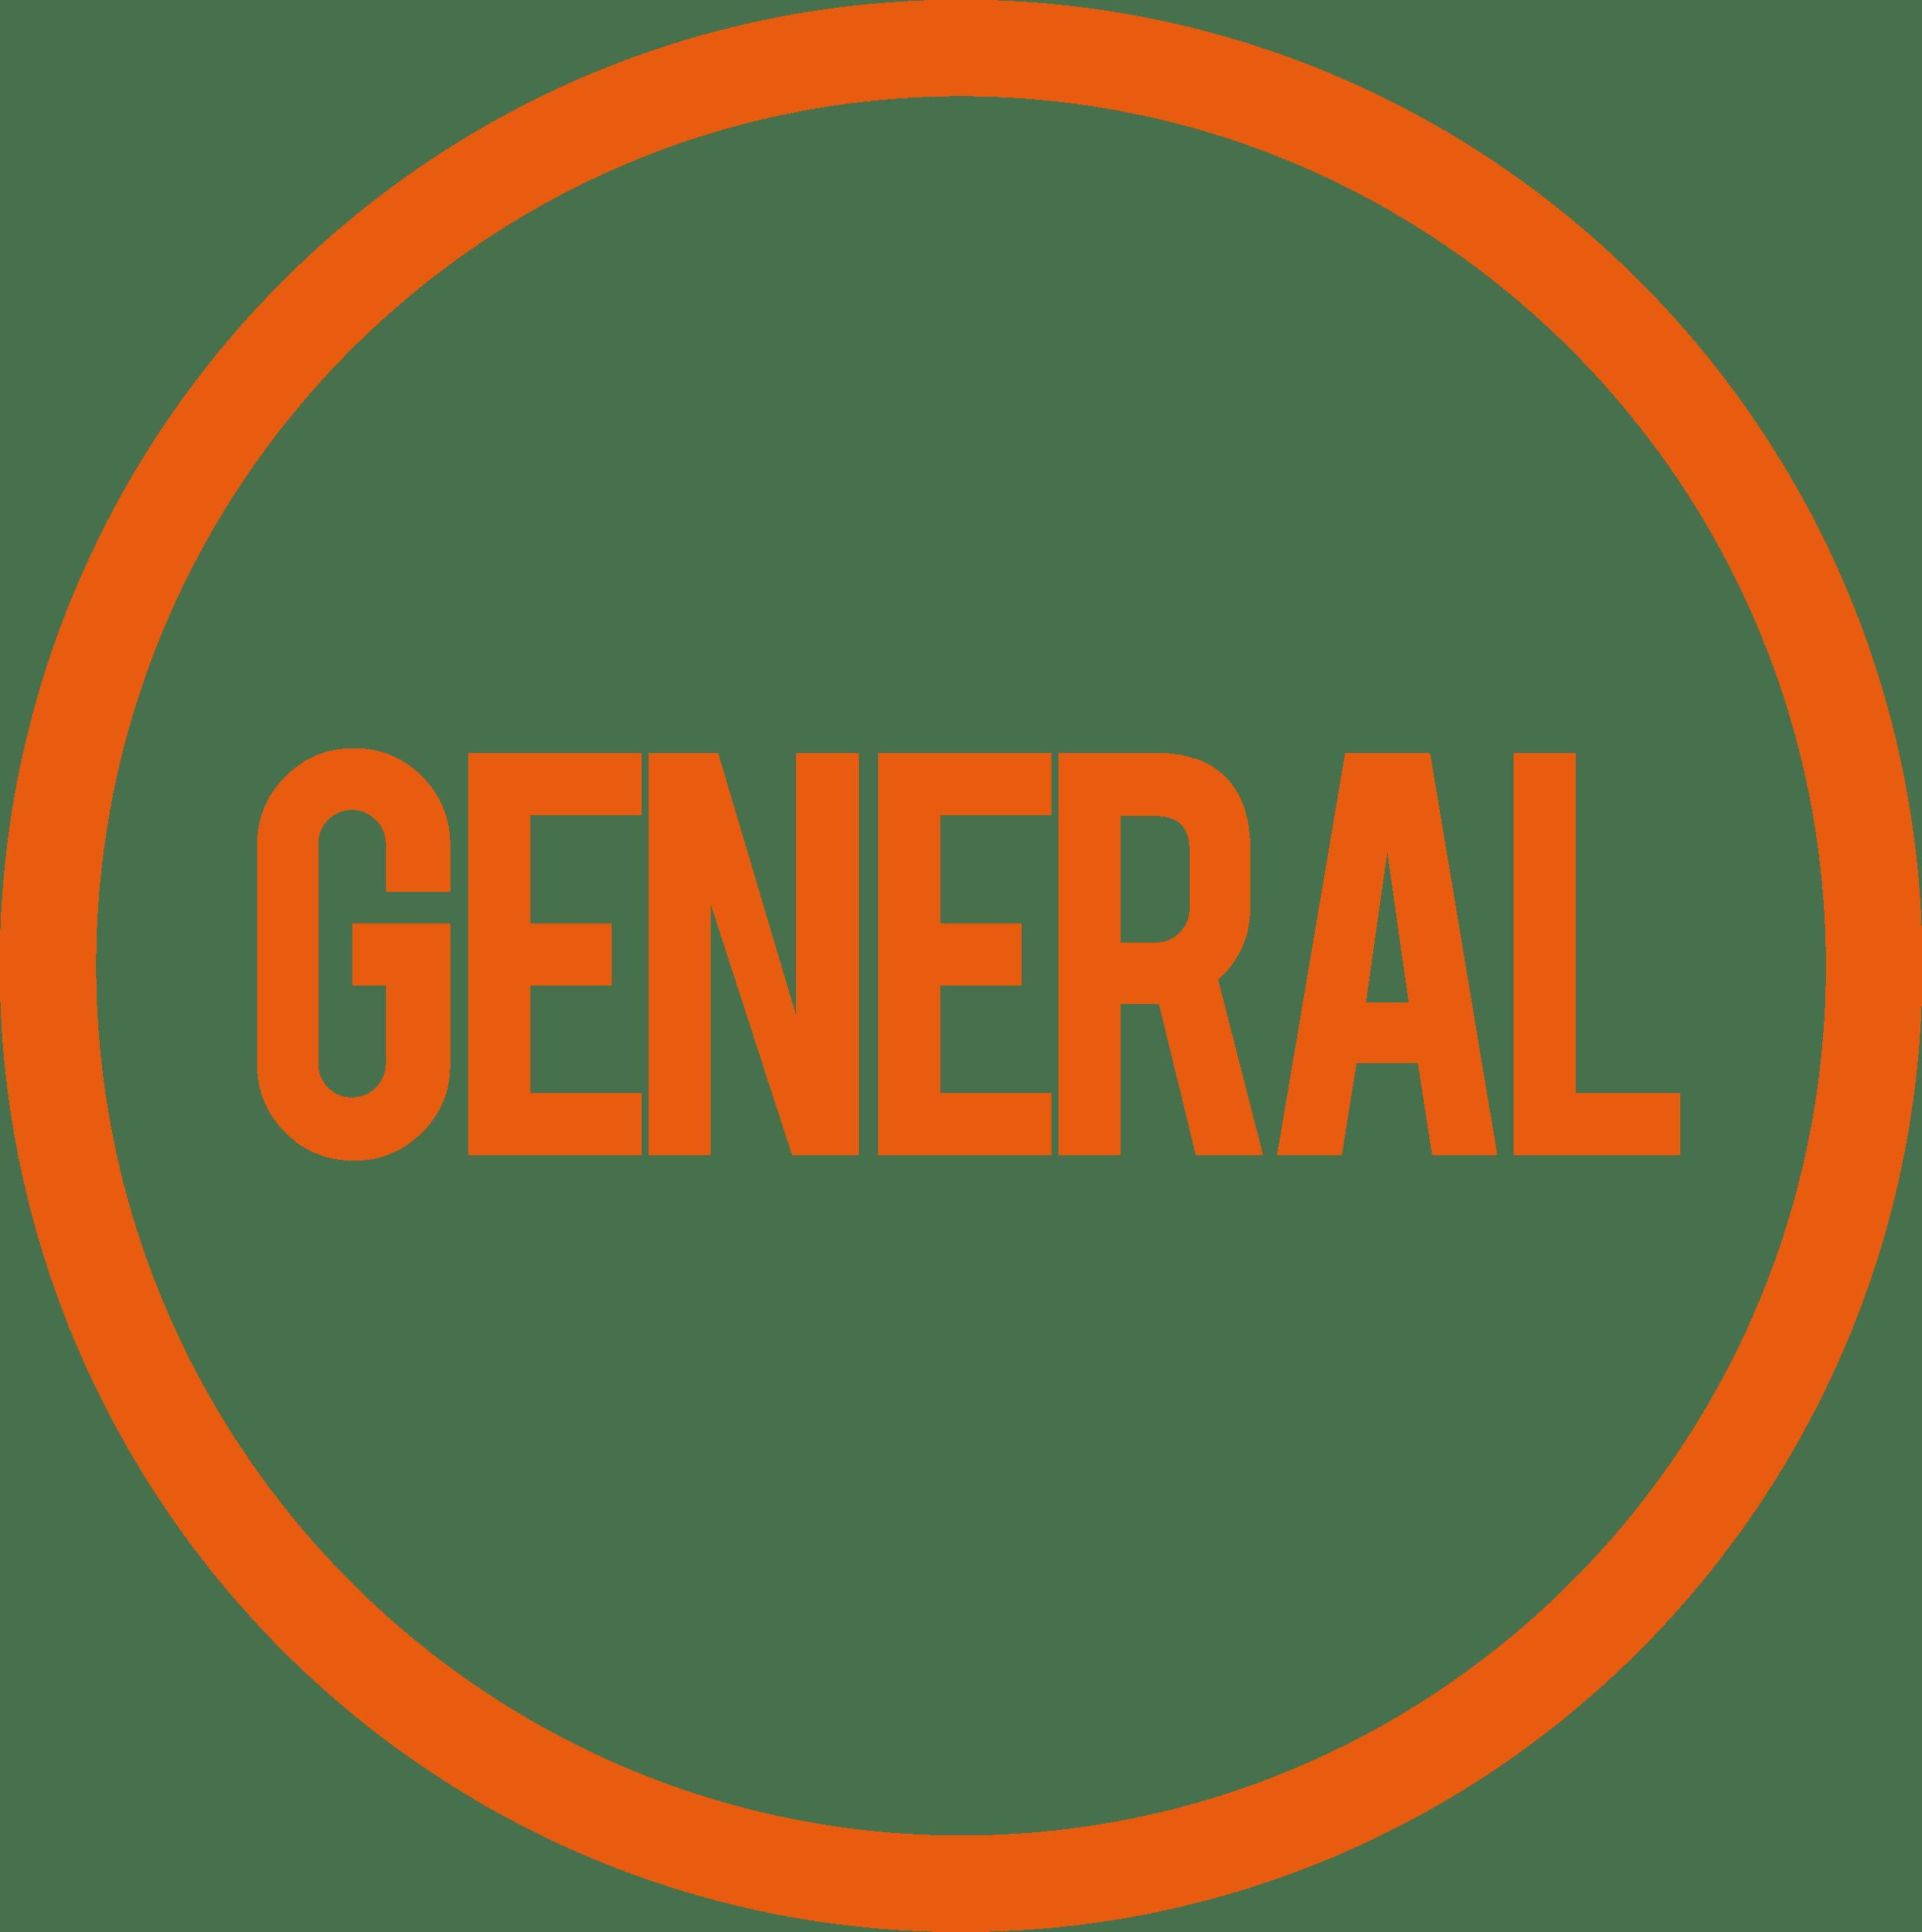 GENERAL category paint theme acrylic akinteractive range